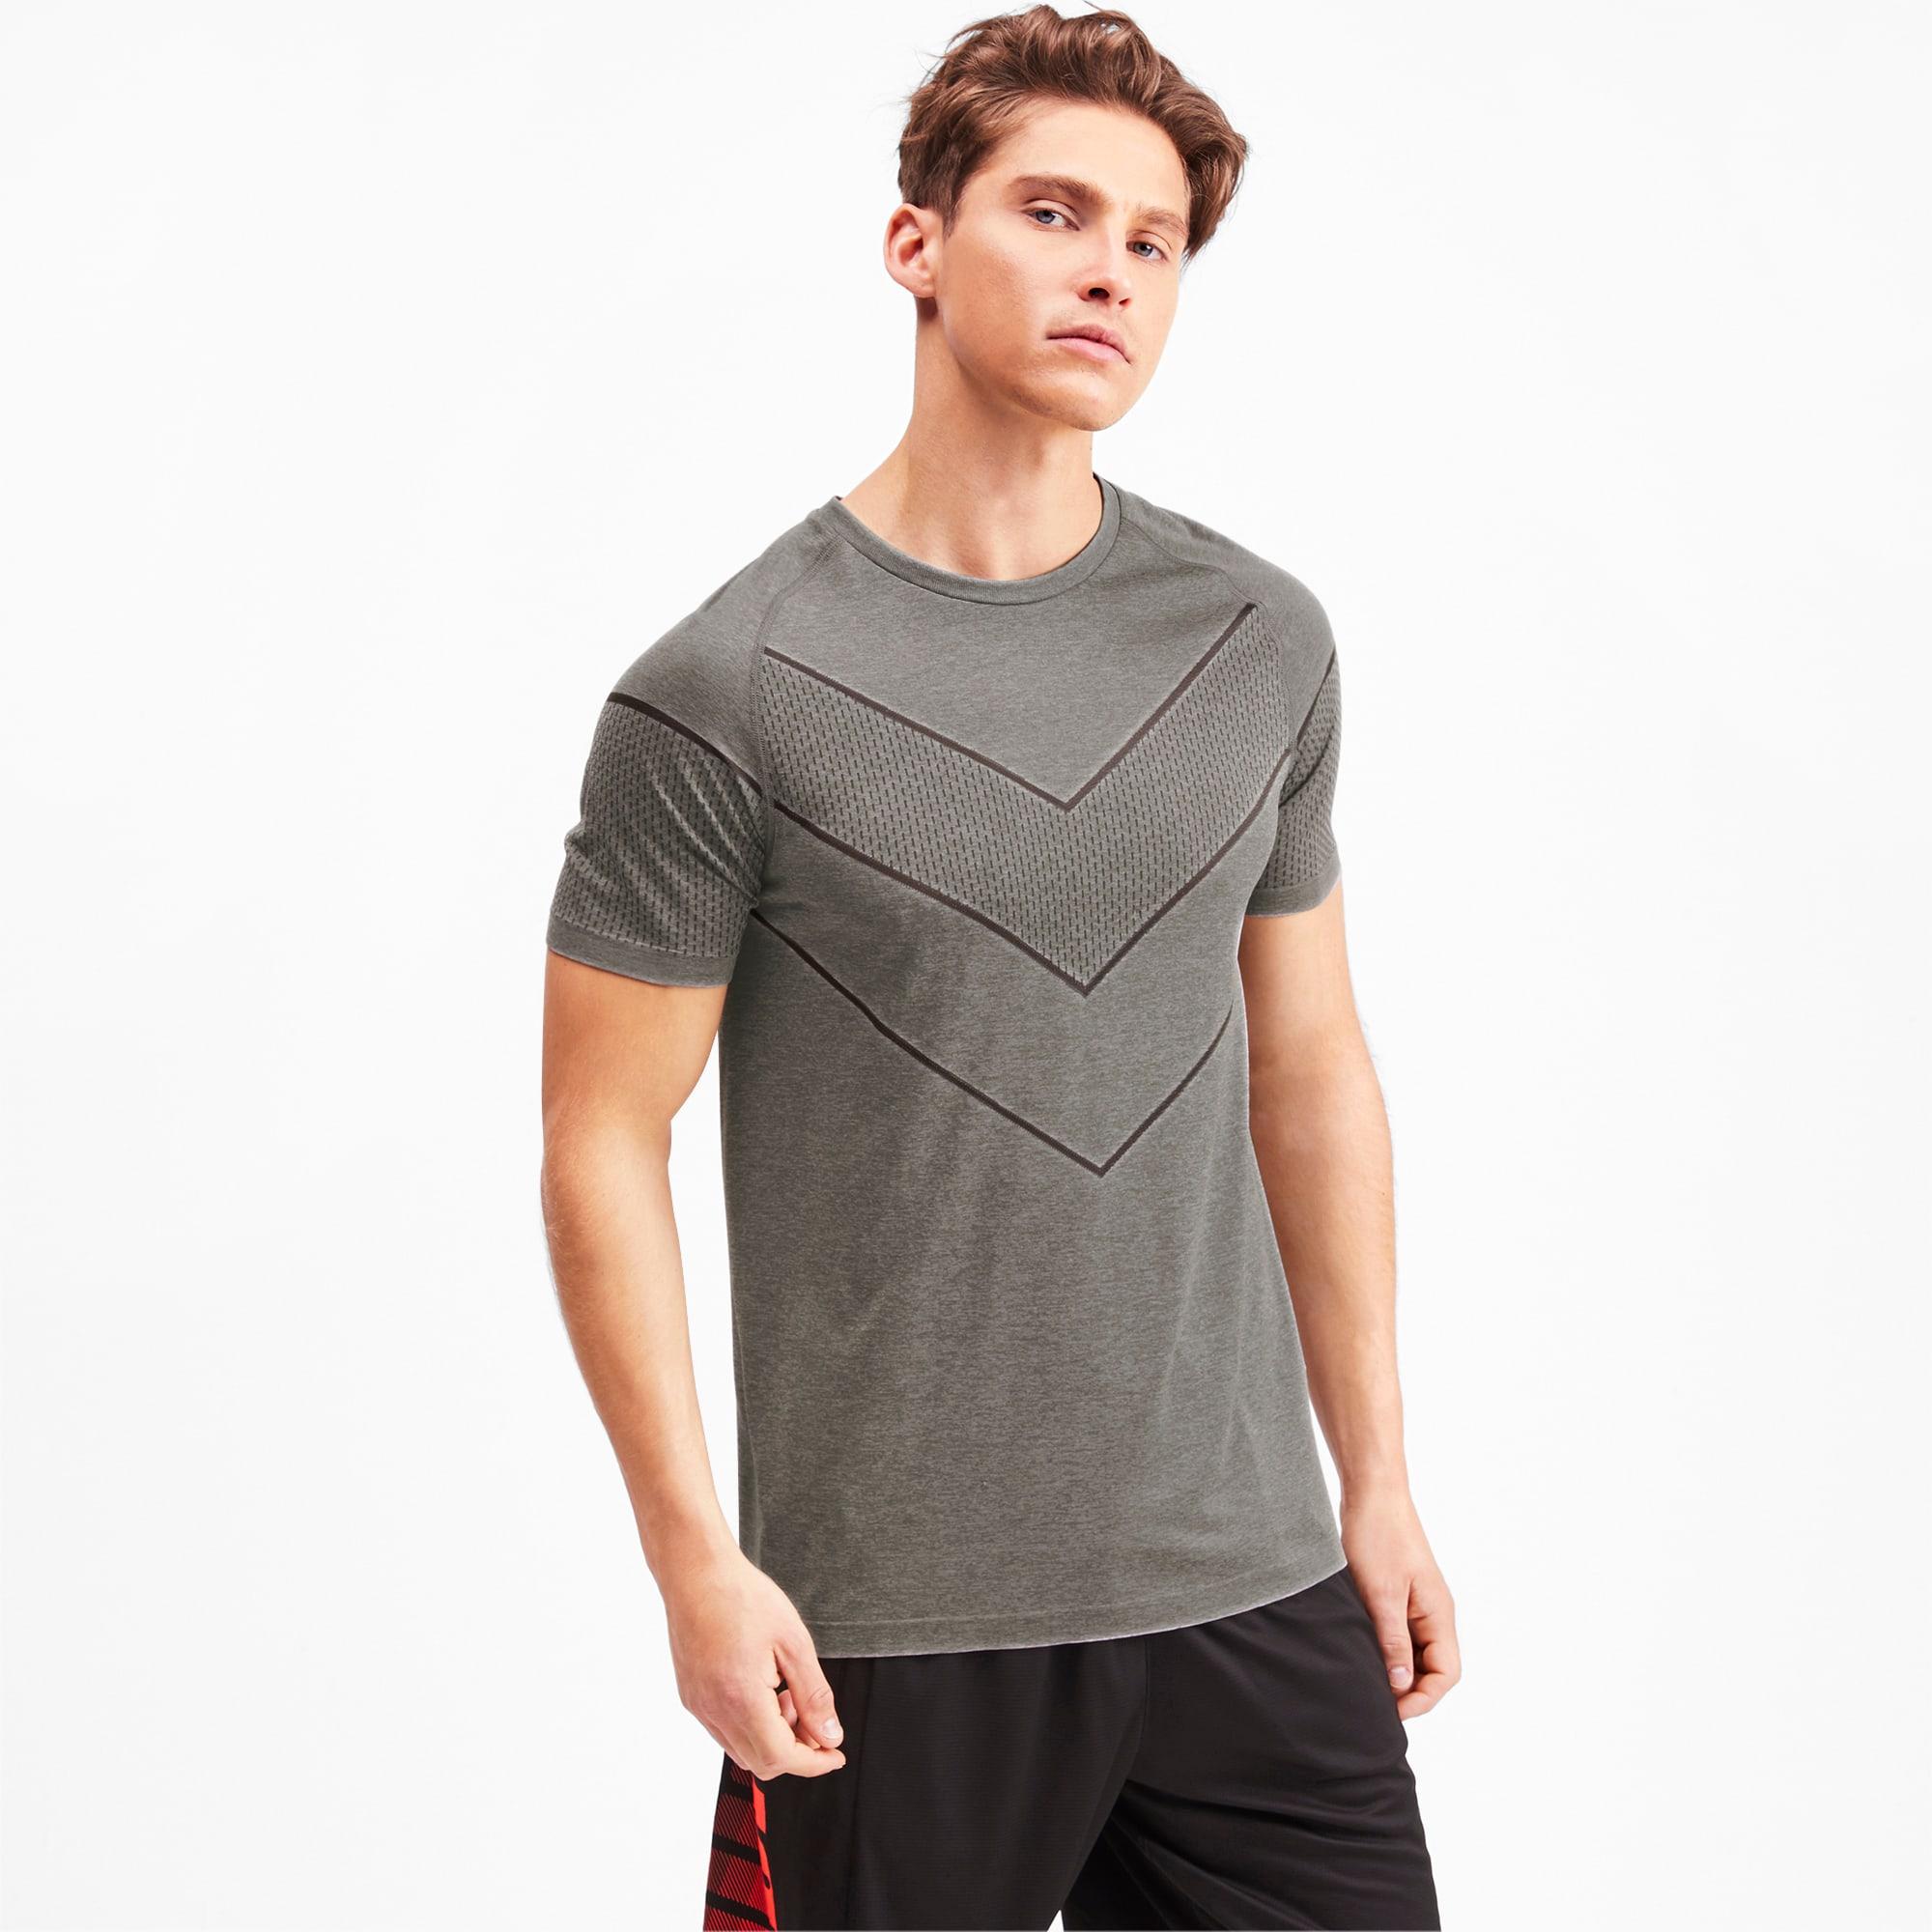 Hombre PUMA Reactive Evoknit tee Camiseta